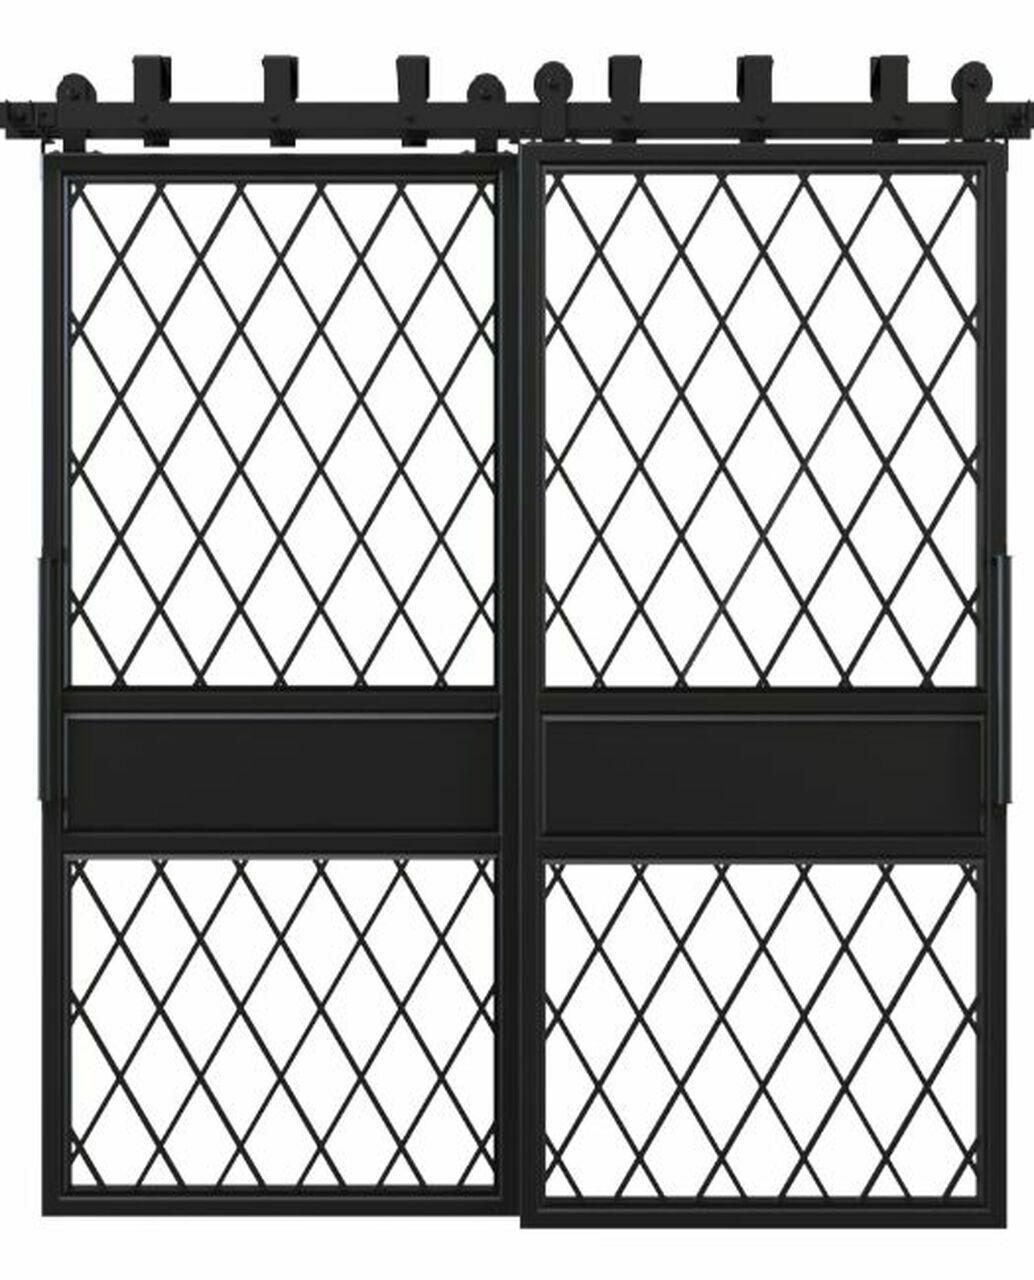 metal two panel glass bypass barn door with diamond pane window